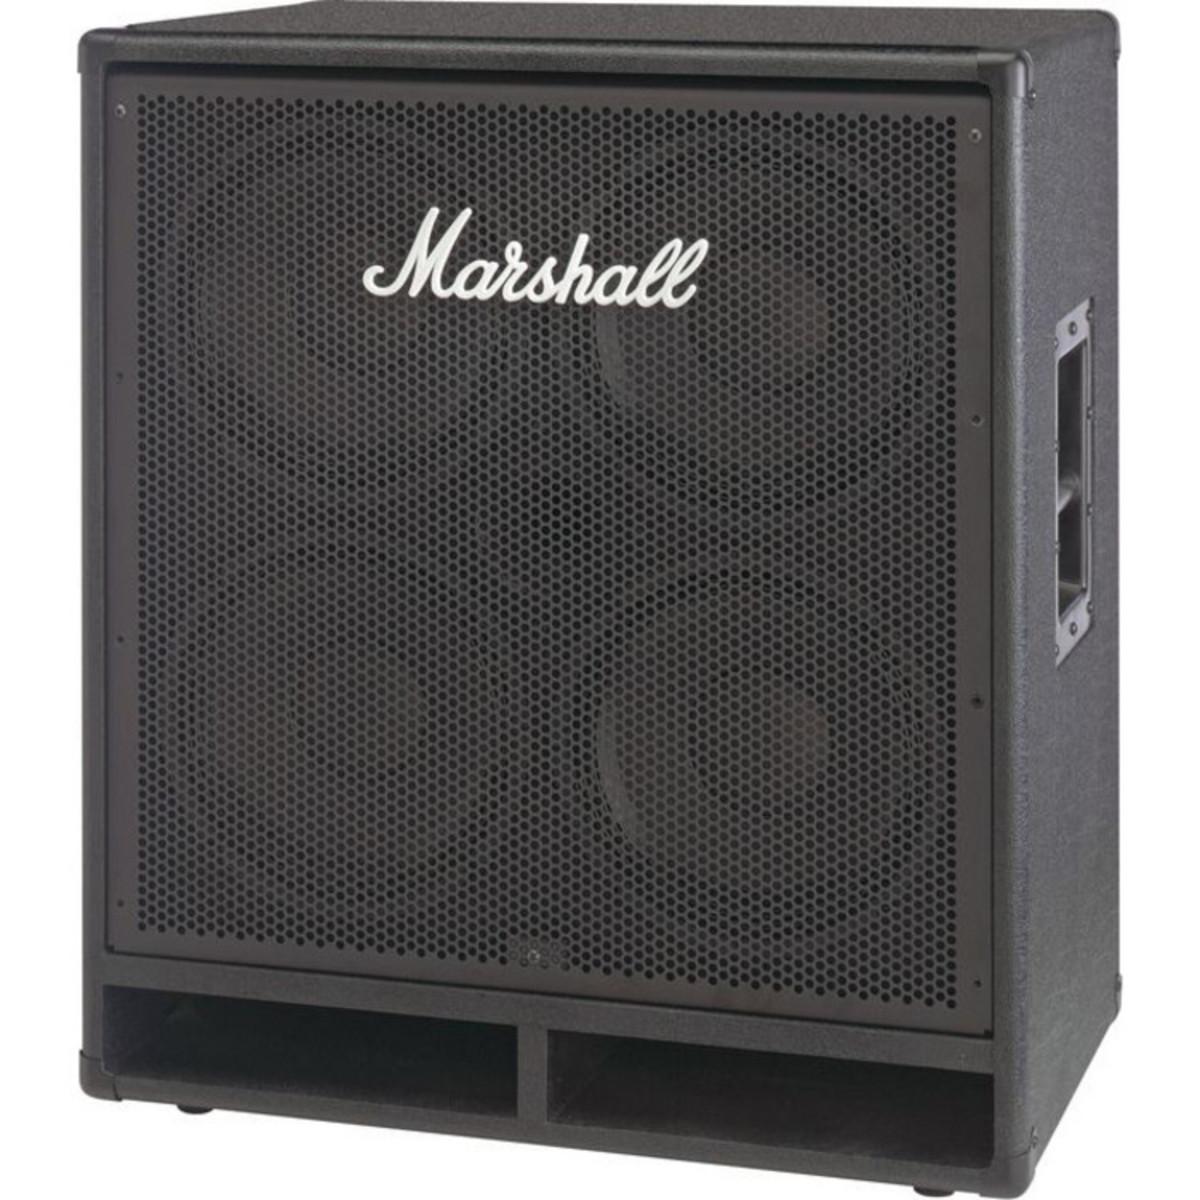 4x10 Guitar Cabinet Marshall Mbc410 600w 4x10 Bass Speaker Cabinet At Gear4musiccom